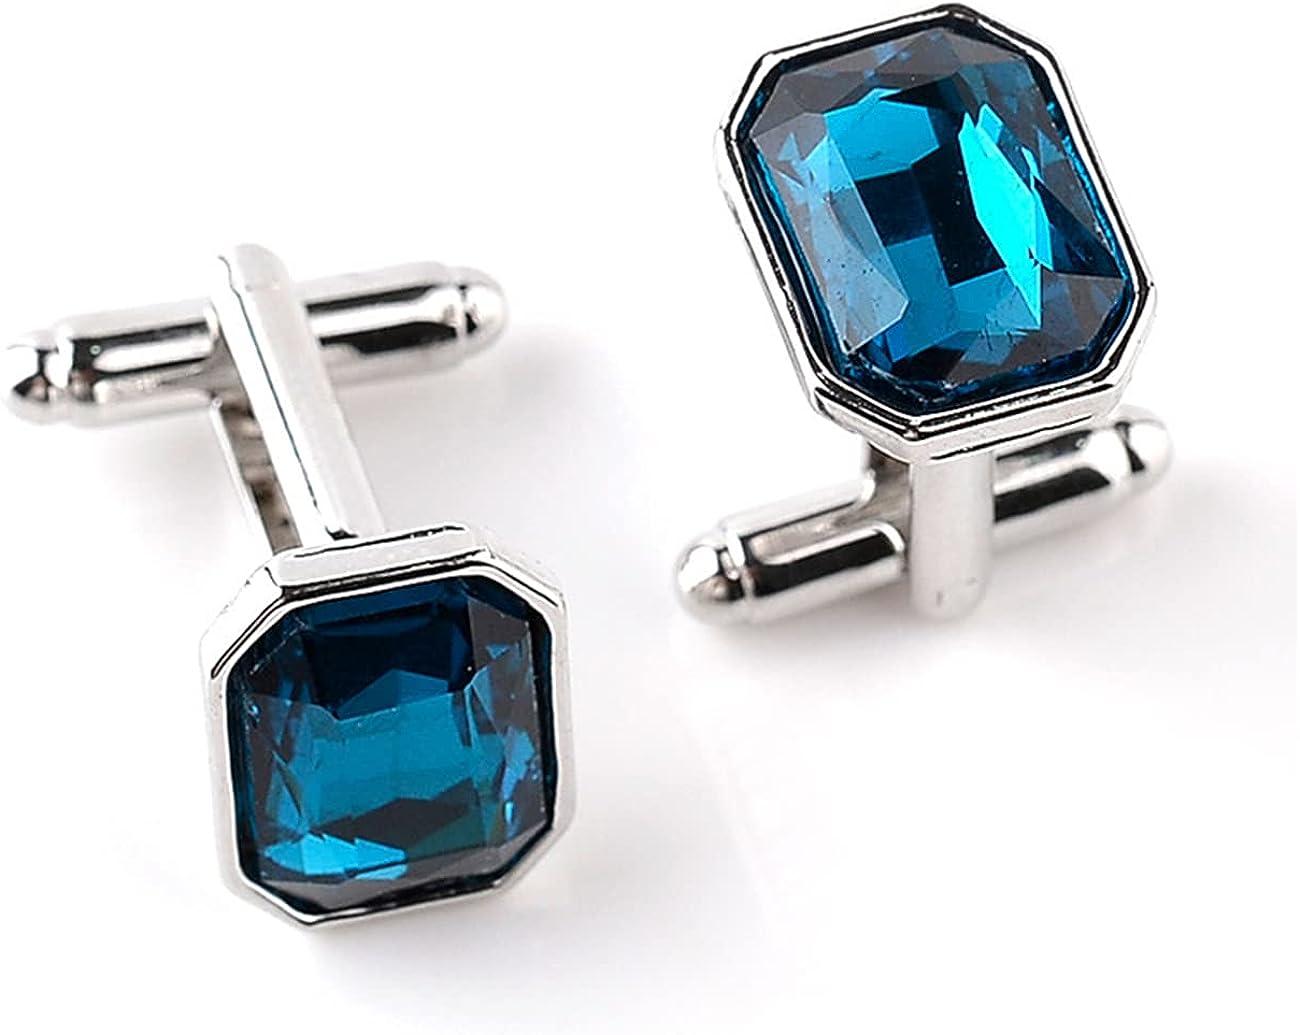 GH8 Mens Classic Stainless Steel Cufflinks Cufflinks Business Wedding Shirts - Rhinestone PXH15#